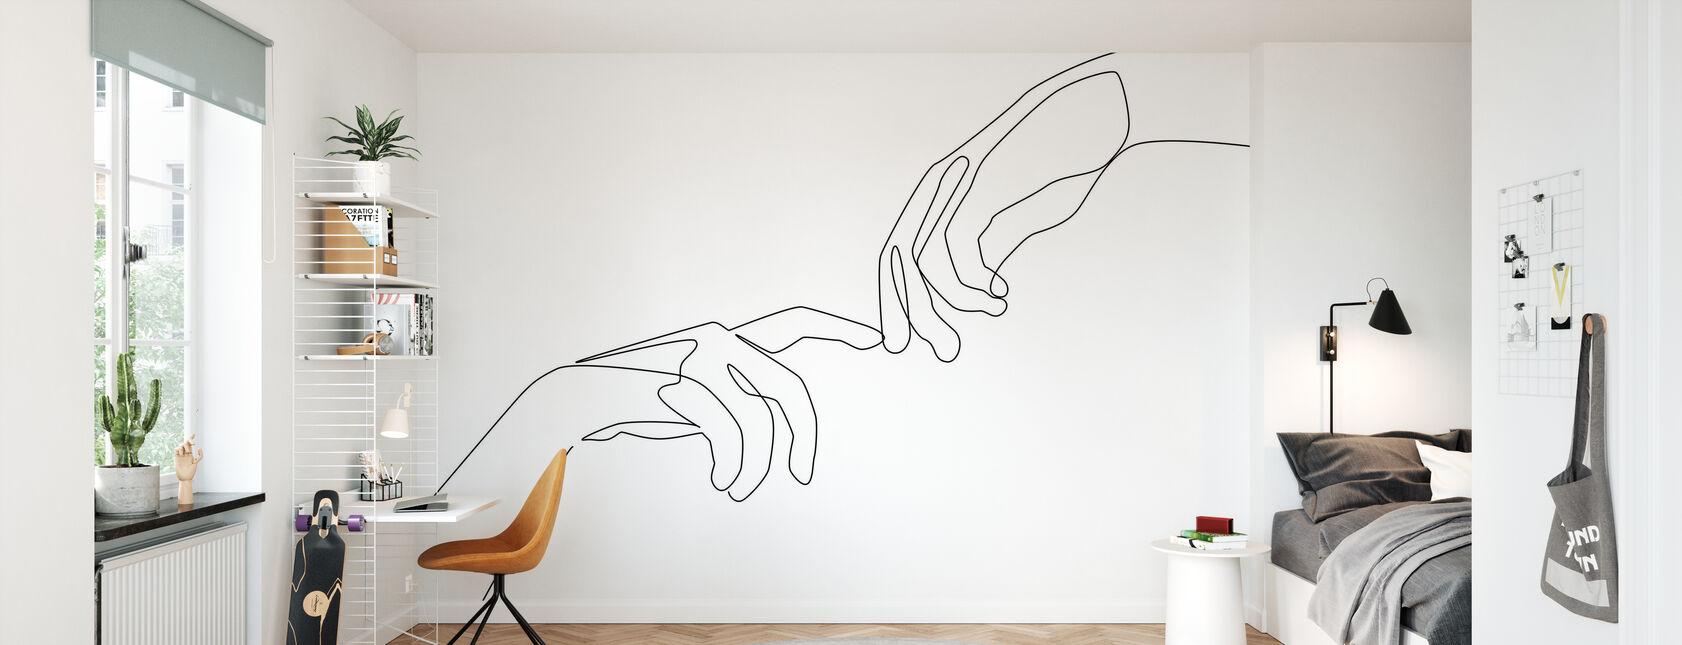 Fingerberøring - Tapet - Barnerom